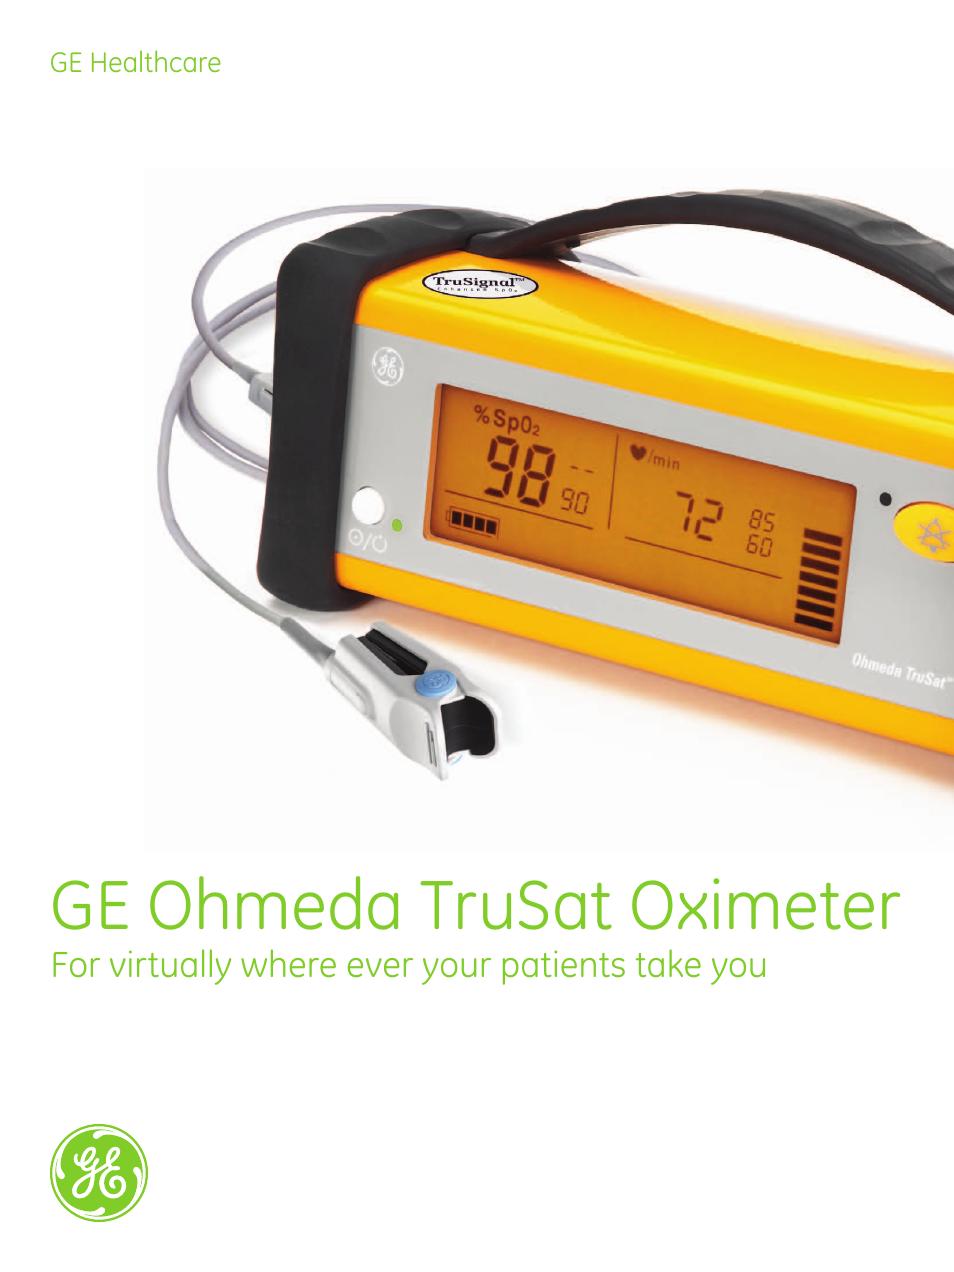 Ge healthcare ge ohmeda trusat oximeter user manual | page 6 / 8.